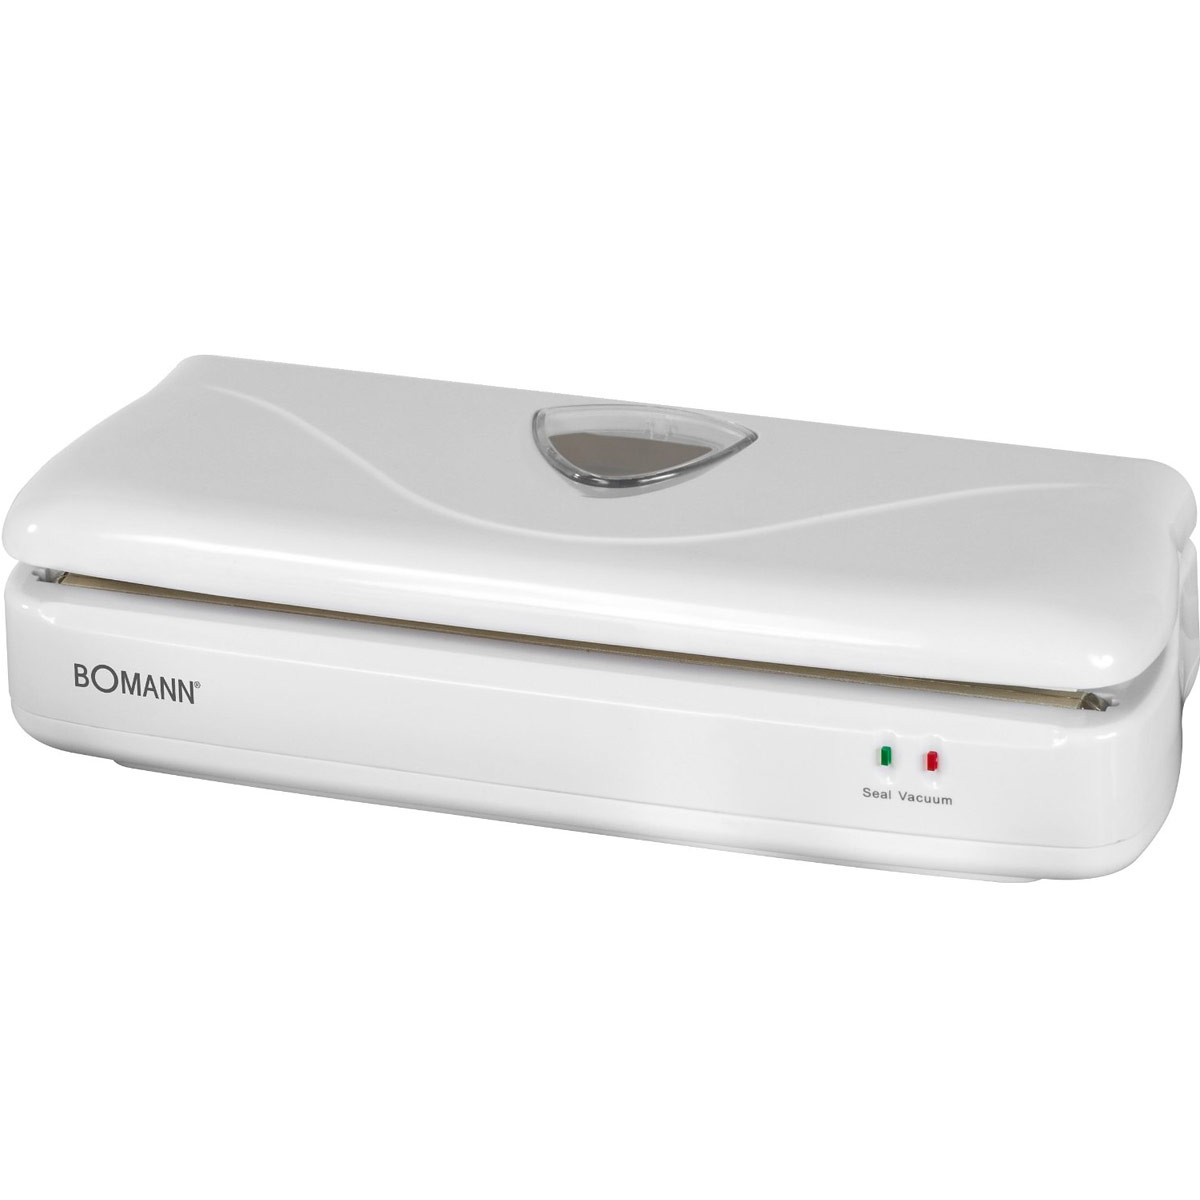 Bomann FS 1014 CB, White вакуумный упаковщик